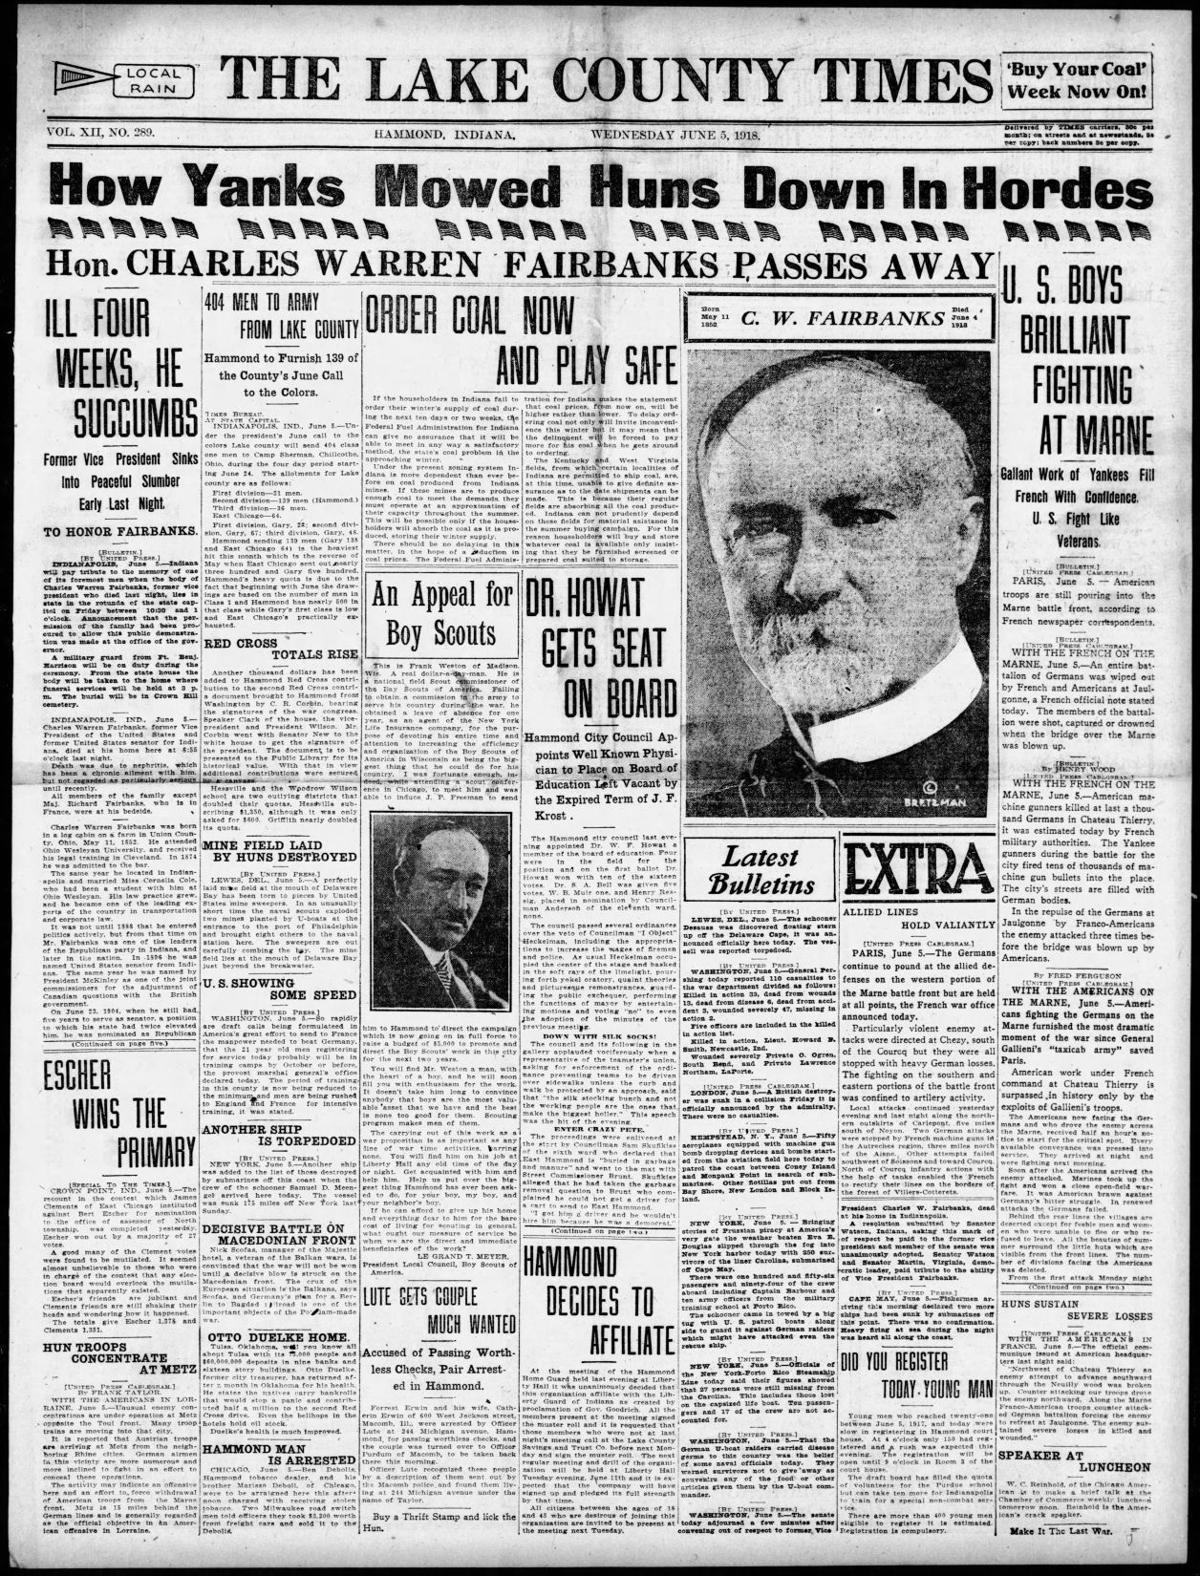 June 5, 1918: Hon. Charles Warren Fairbanks Passes Away